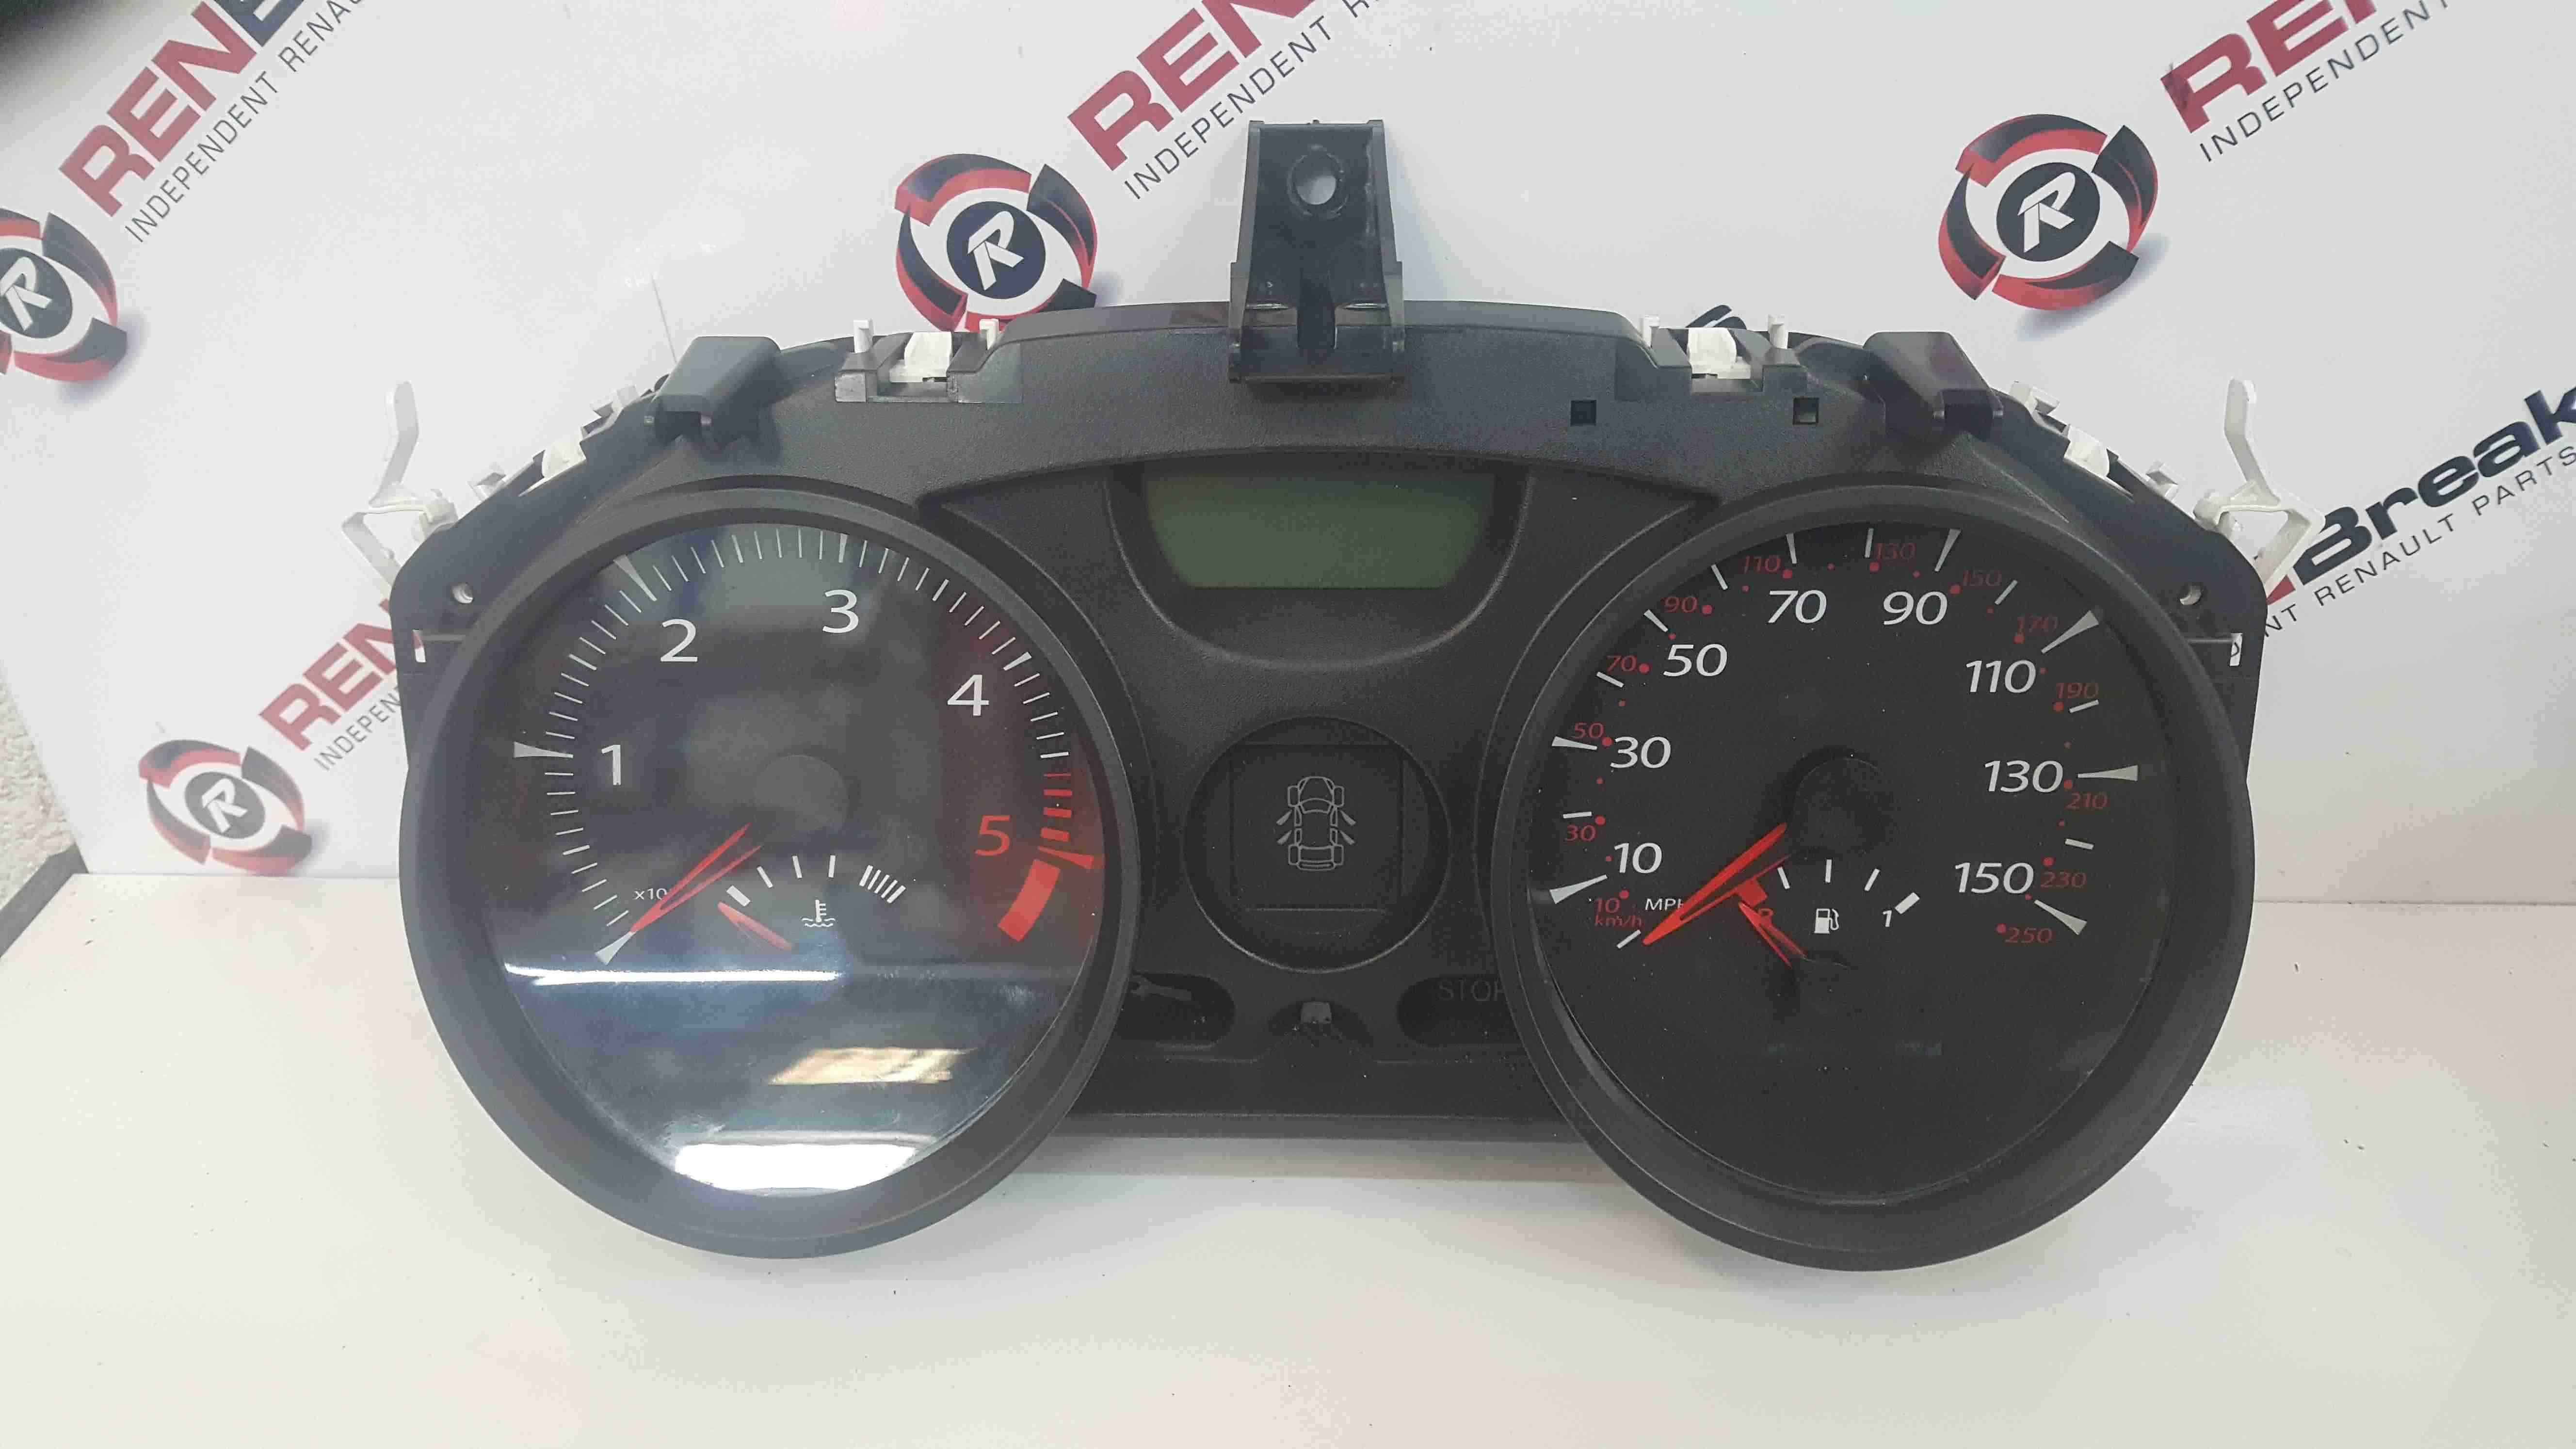 Renault Megane Convertible 2002-2008 Instrument Panel Dials Clocks 68k